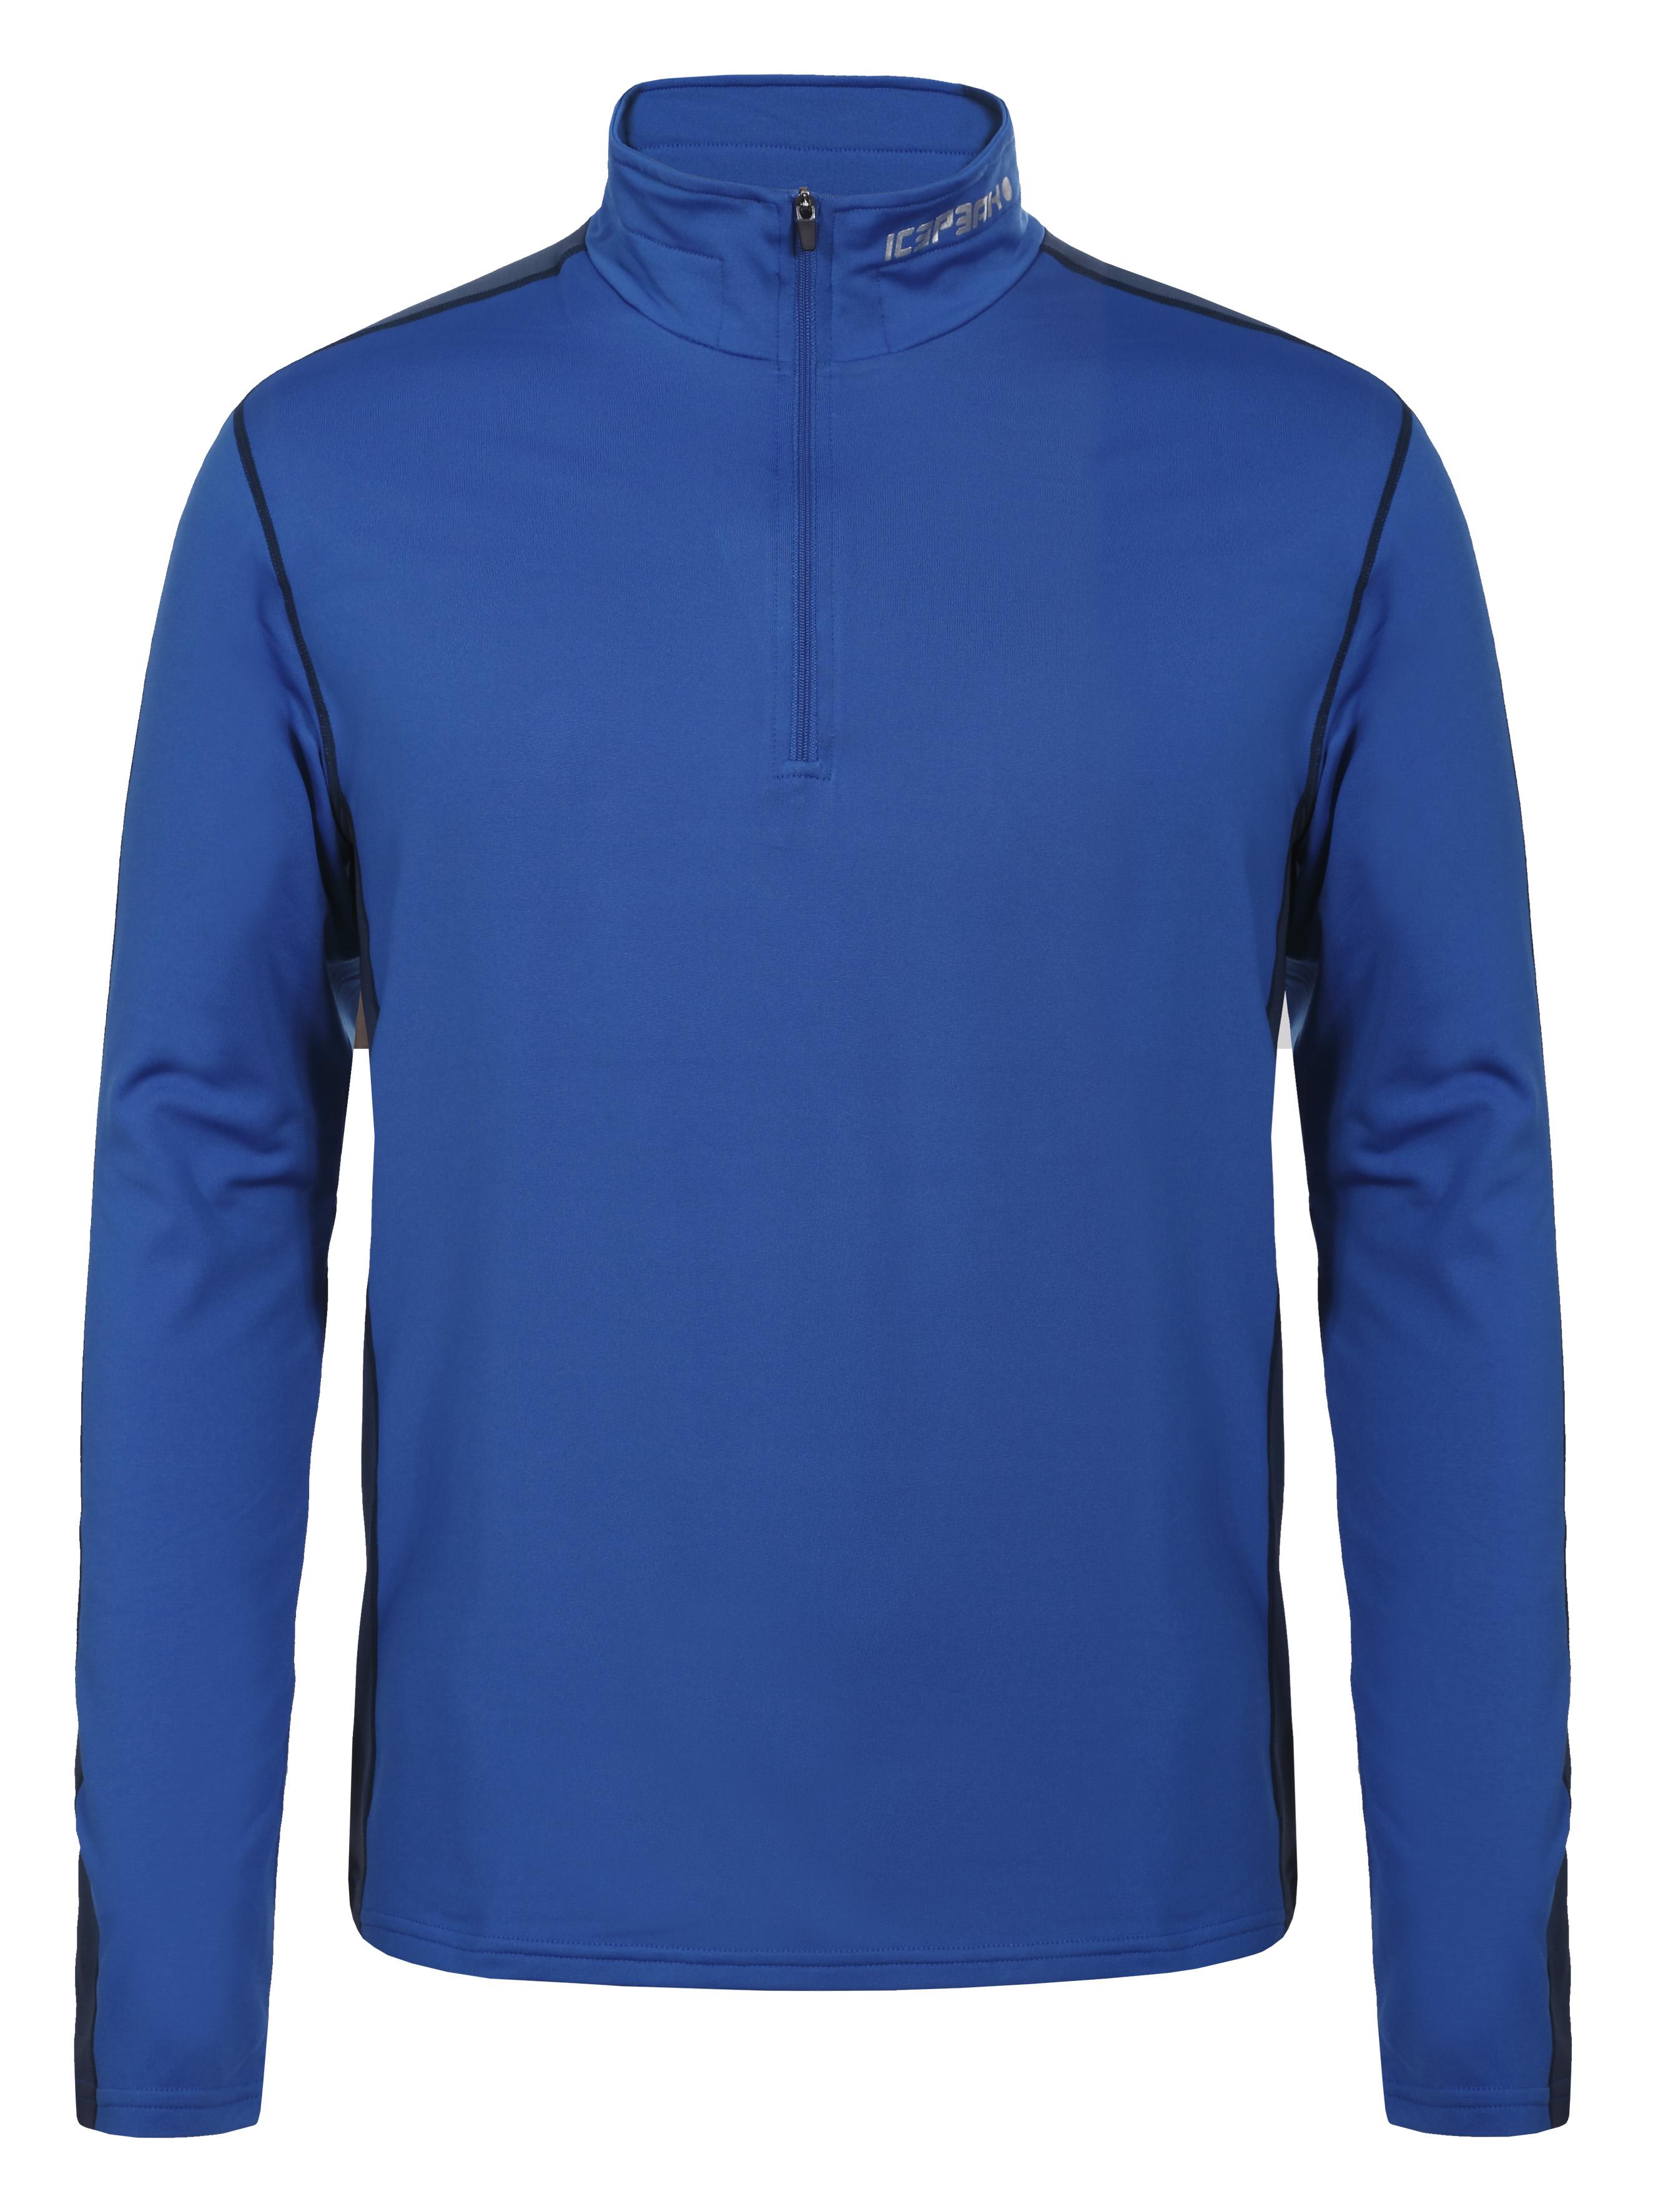 Icepeak ROBIN, muški skijaški flis, plava